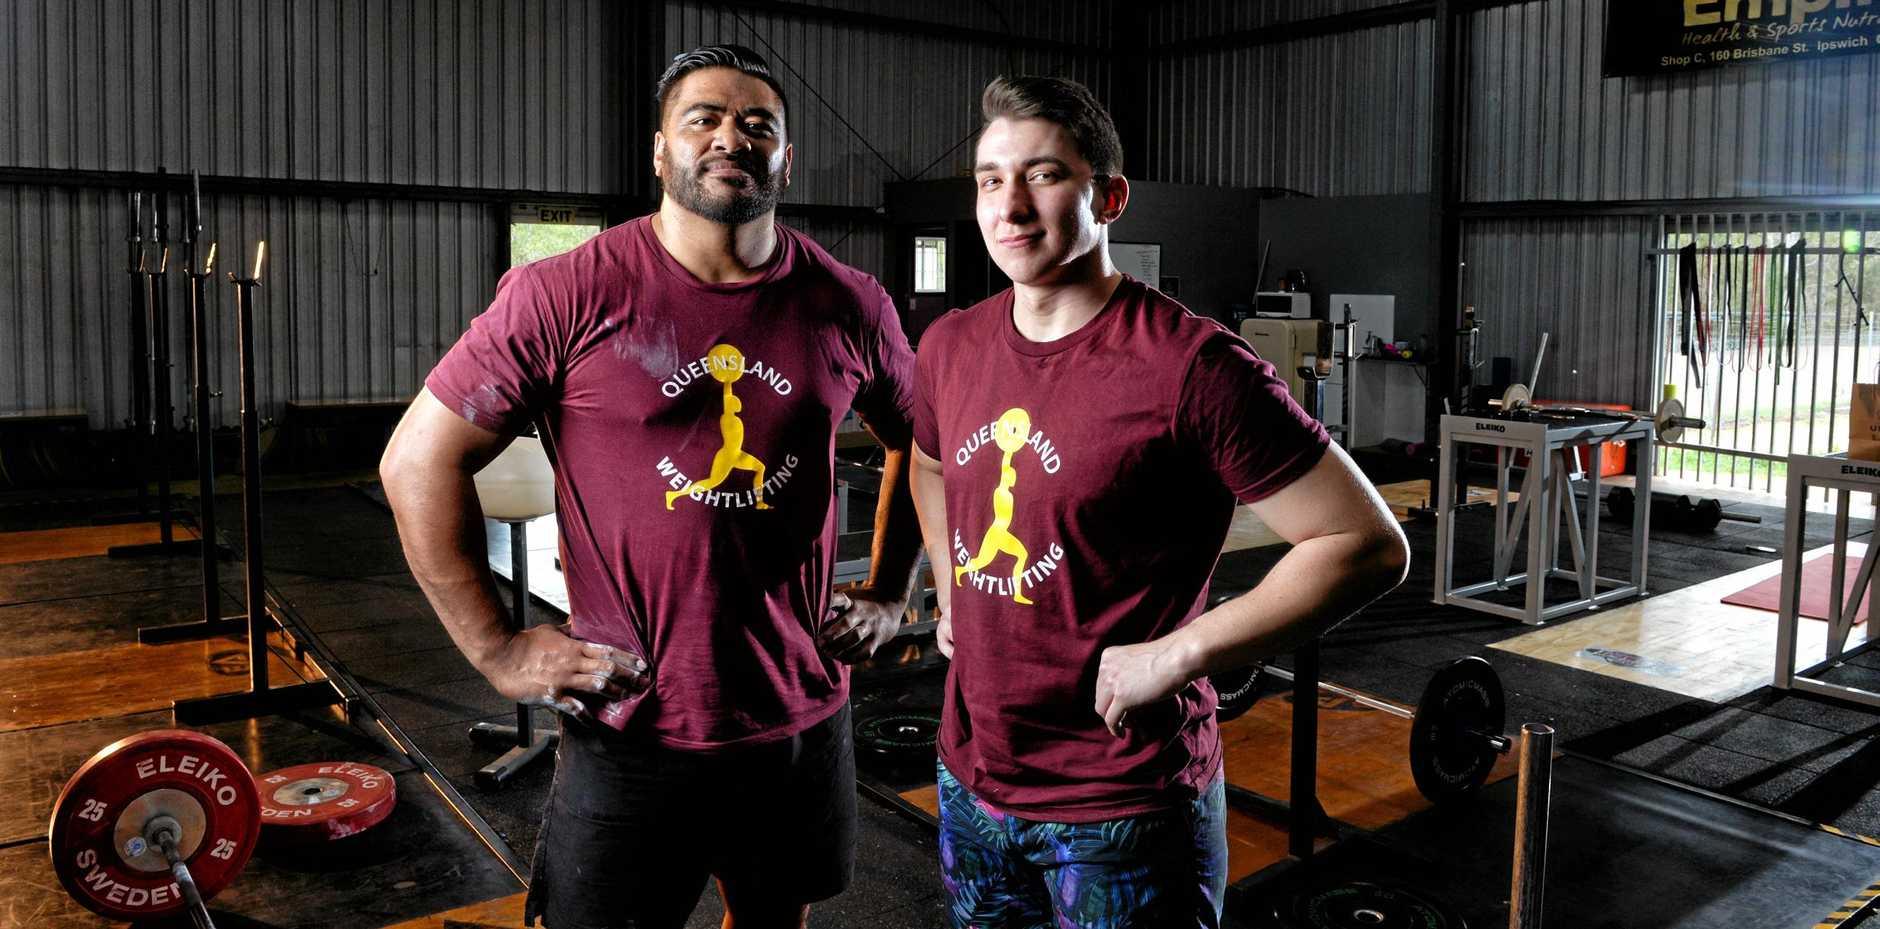 POWERFUL PARTNERSHIP: Jax Solofa and Braydan Fender of Ipswich Weightlifting Club are Australian Weightlifting Federation senior and junior champions.